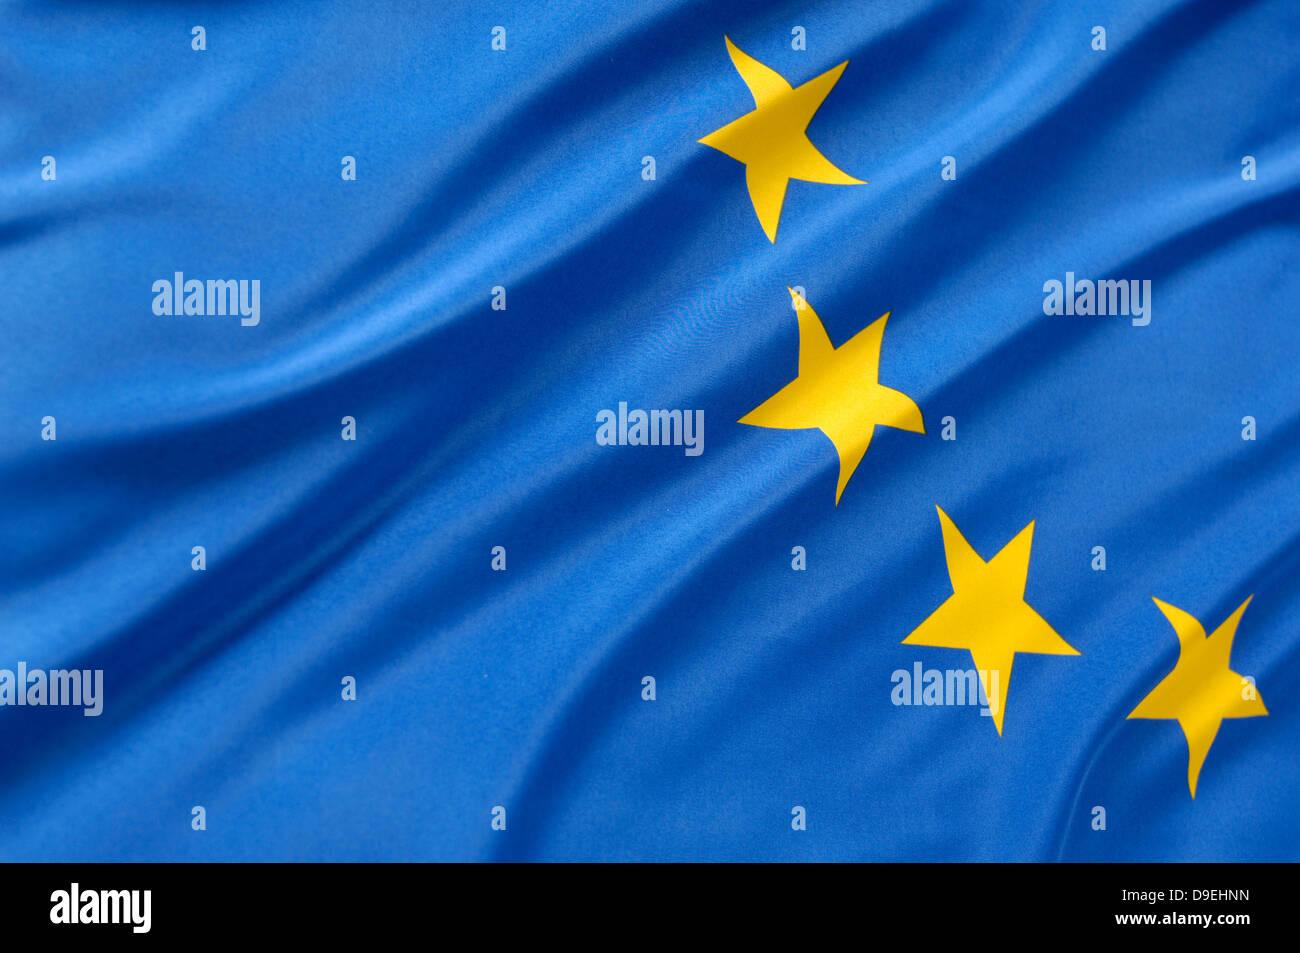 flag of EEC, europe, stars, EG, european community - Stock Image